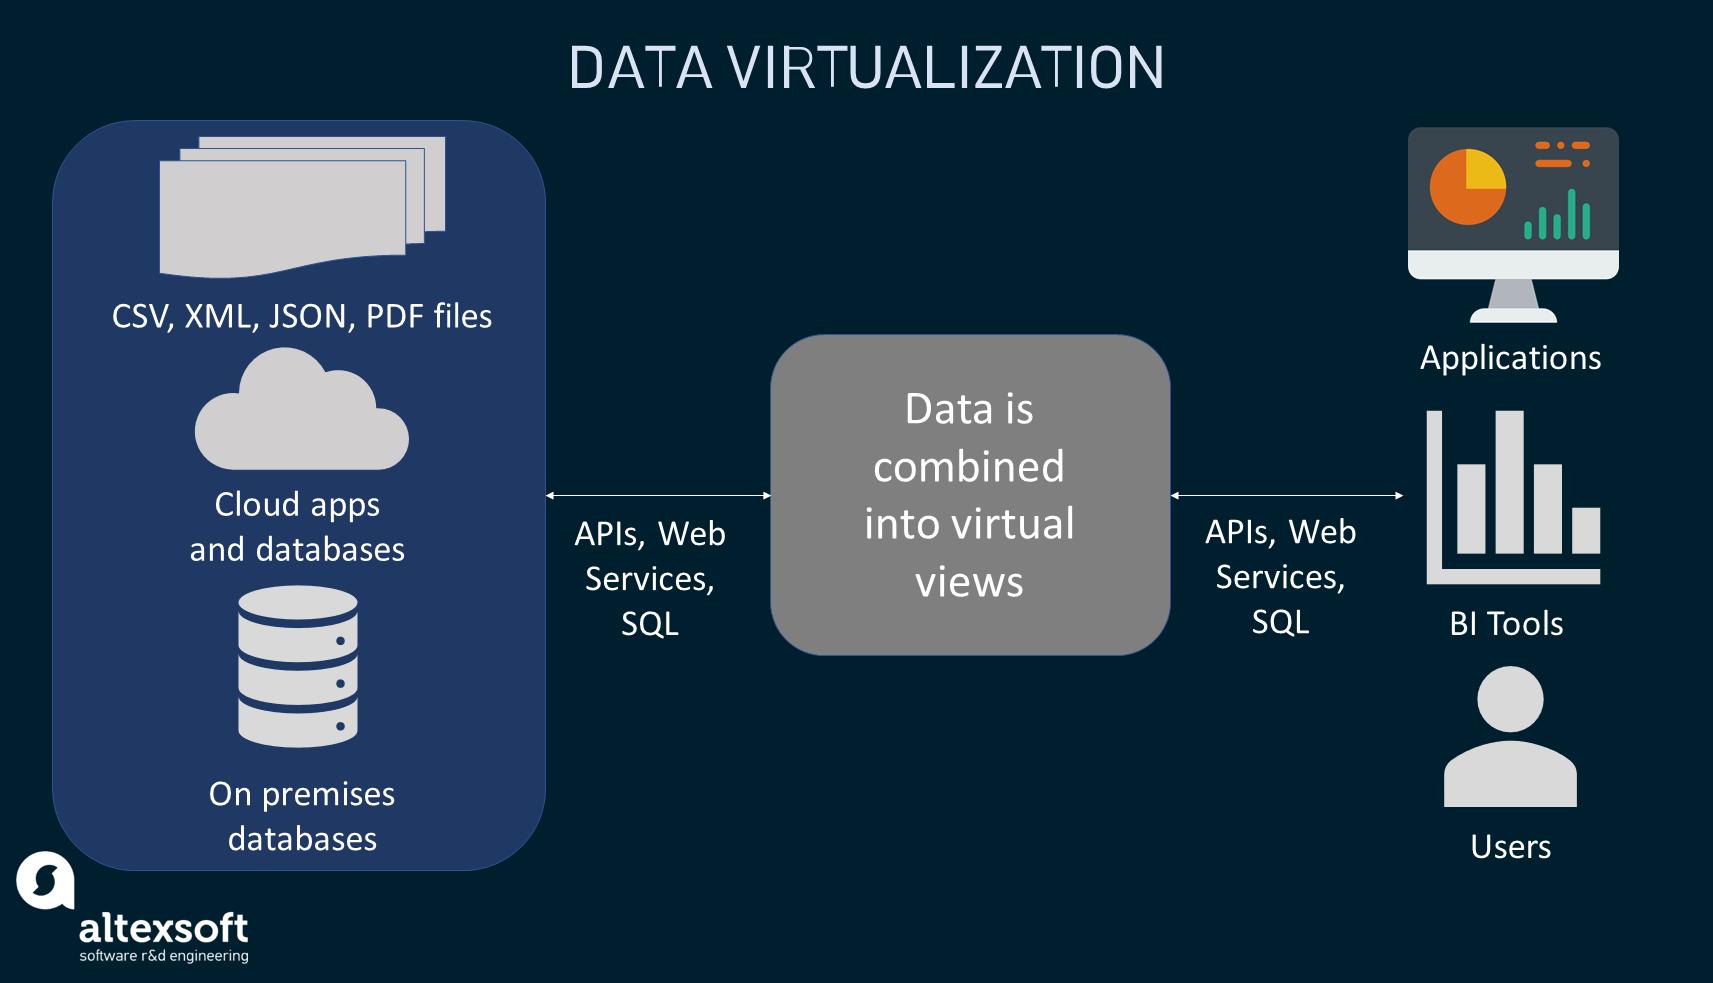 How data virtualization works